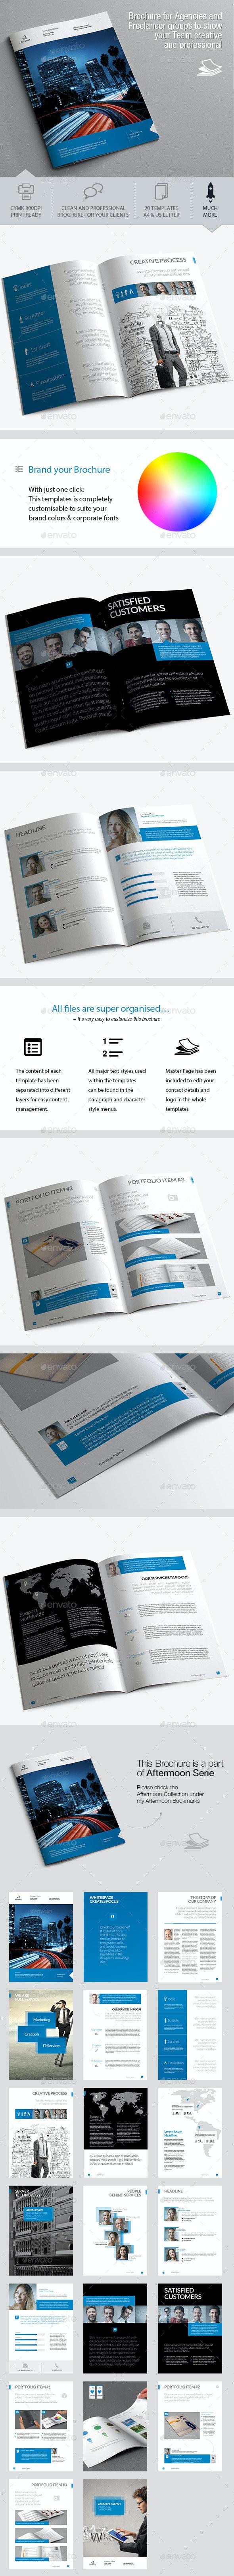 Image Brochure Template - Corporate Brochures